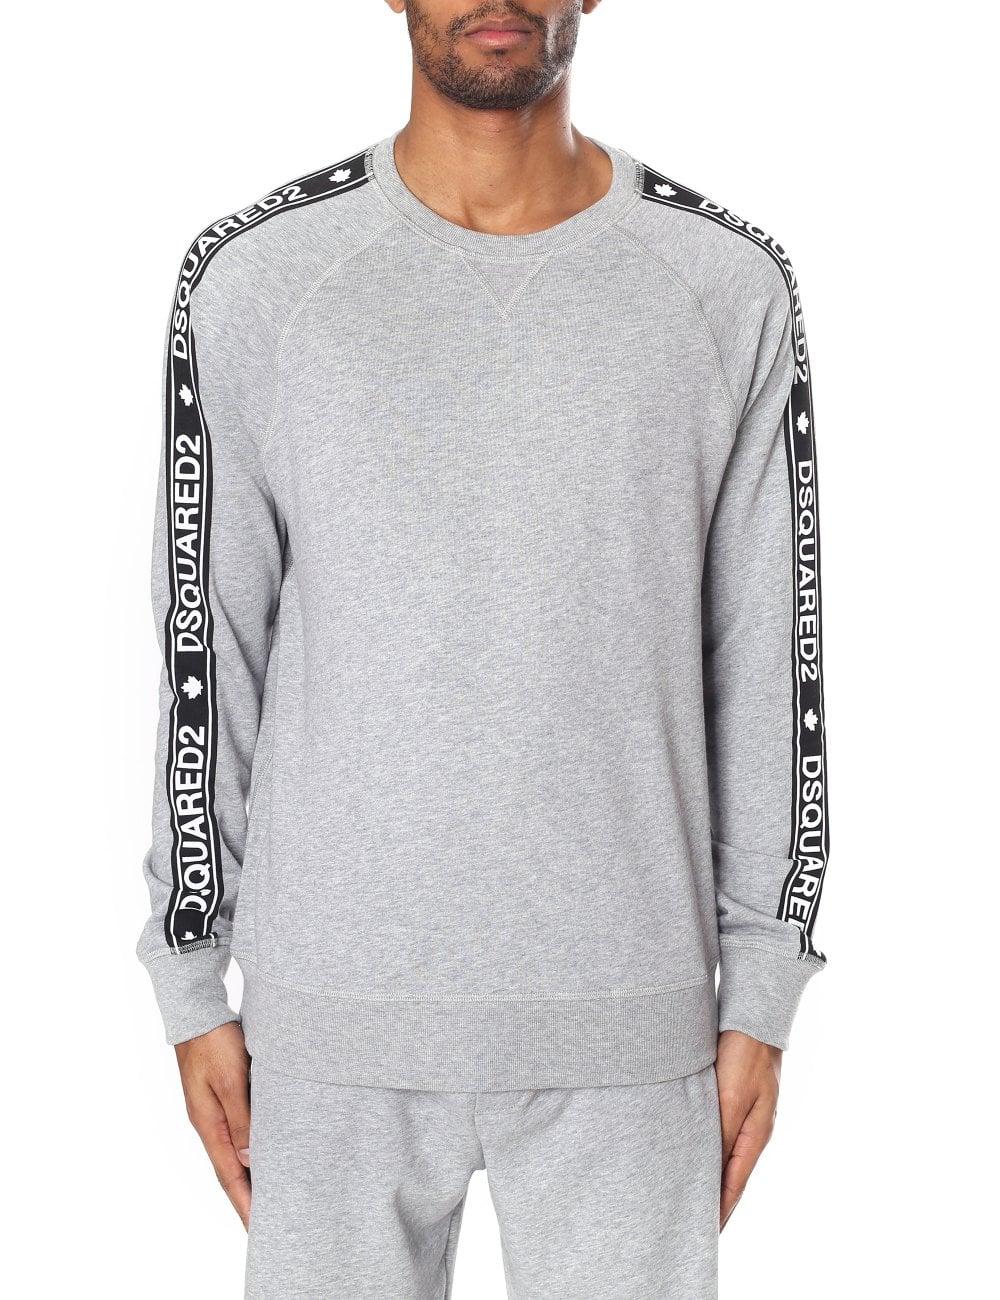 374c7c6b8428de DSquared2 Men's Logo Tape Crew Neck Sweatshirt